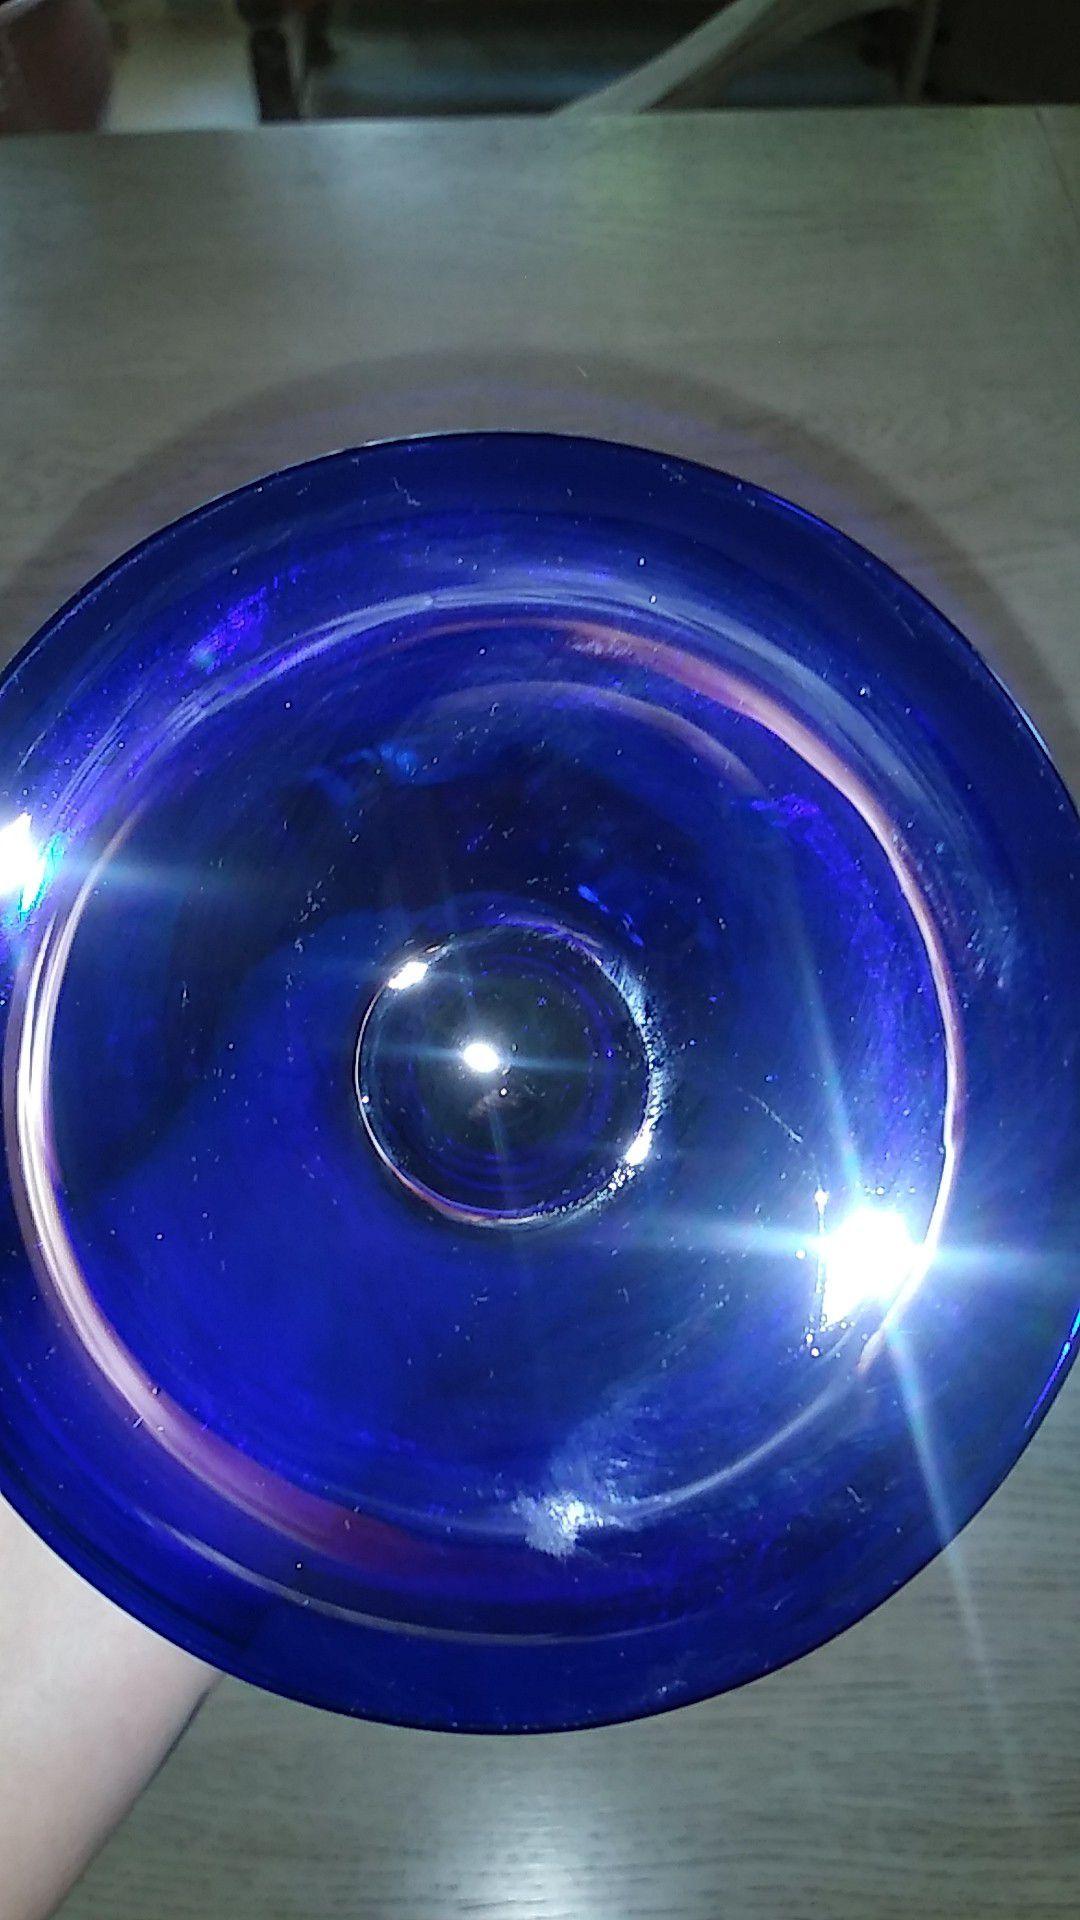 Cobalt blue antique